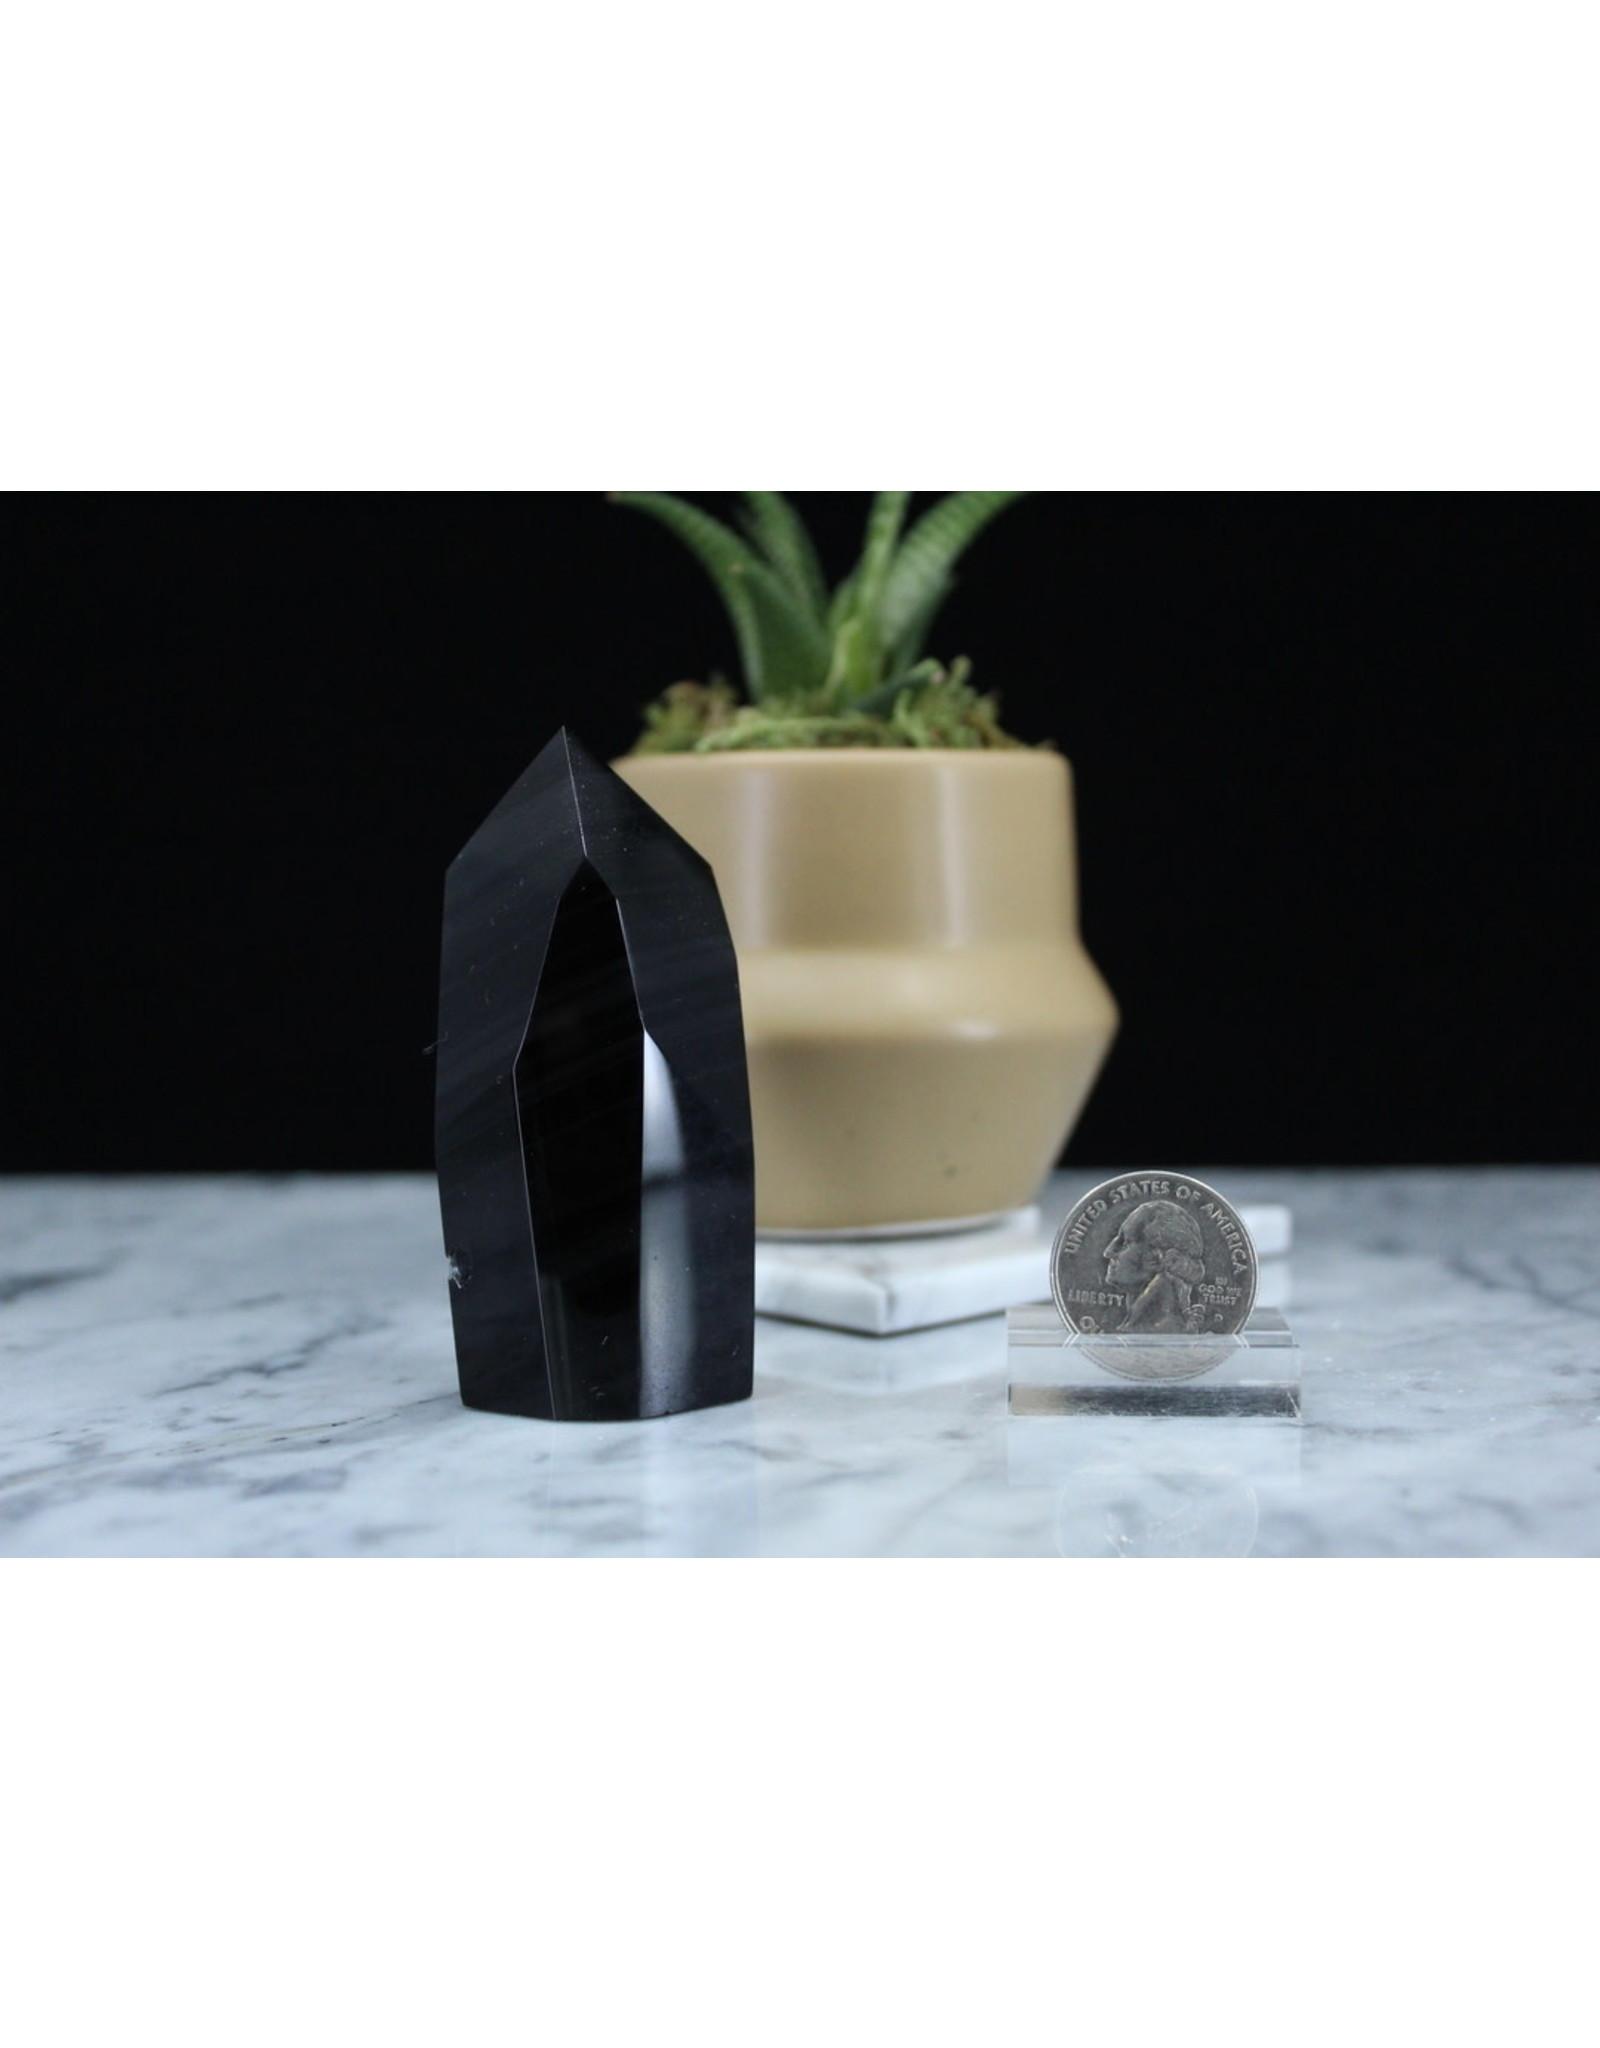 Banded Black Obsidian Free Form Point